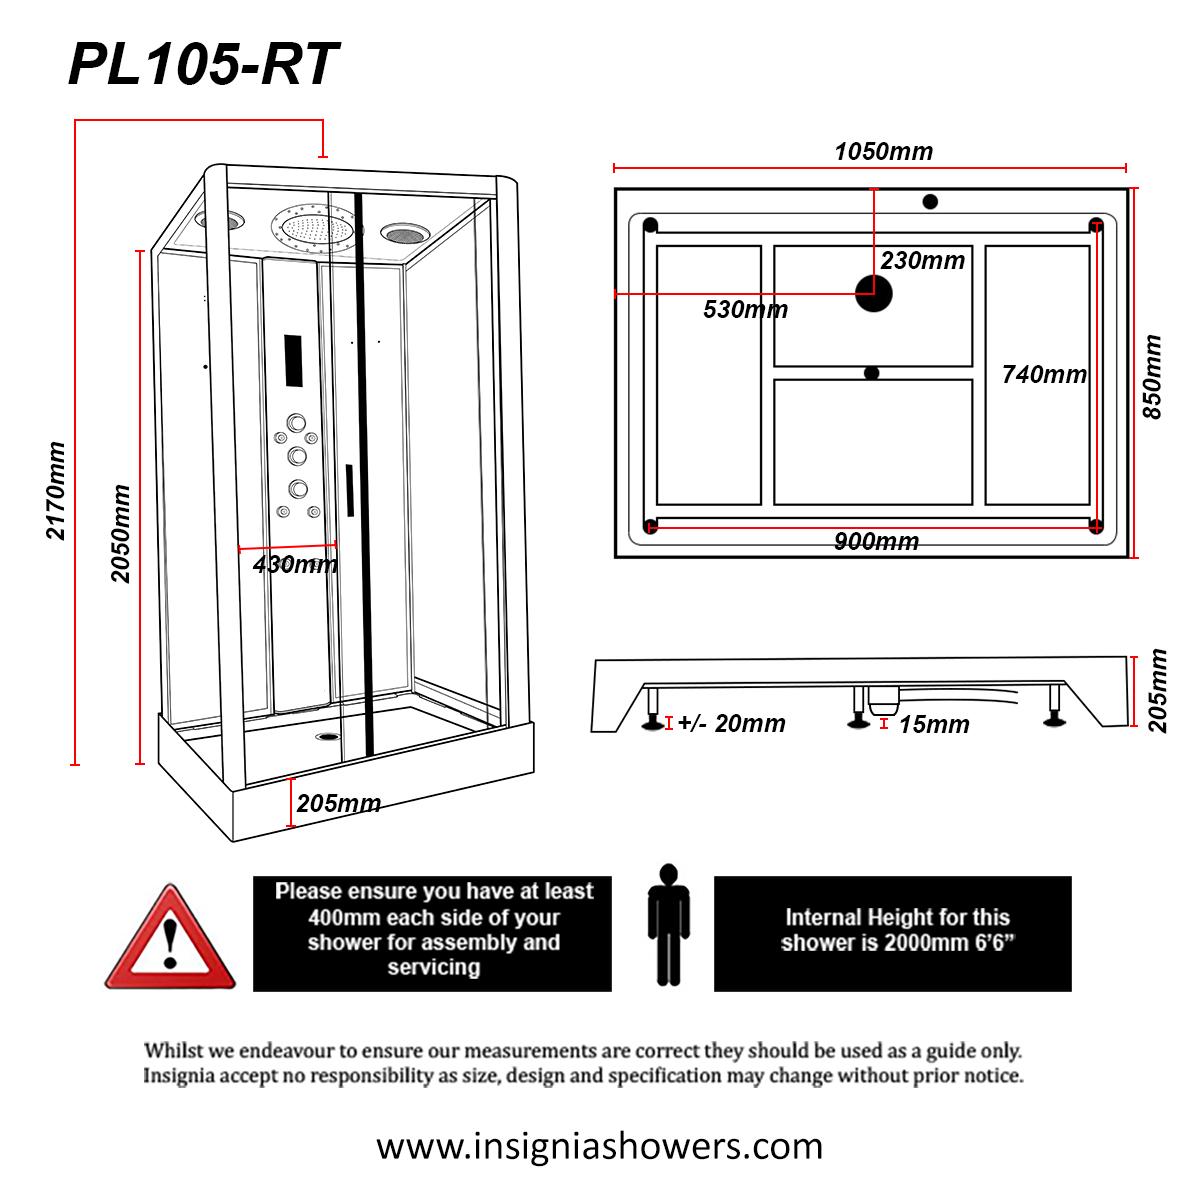 PL105-RT